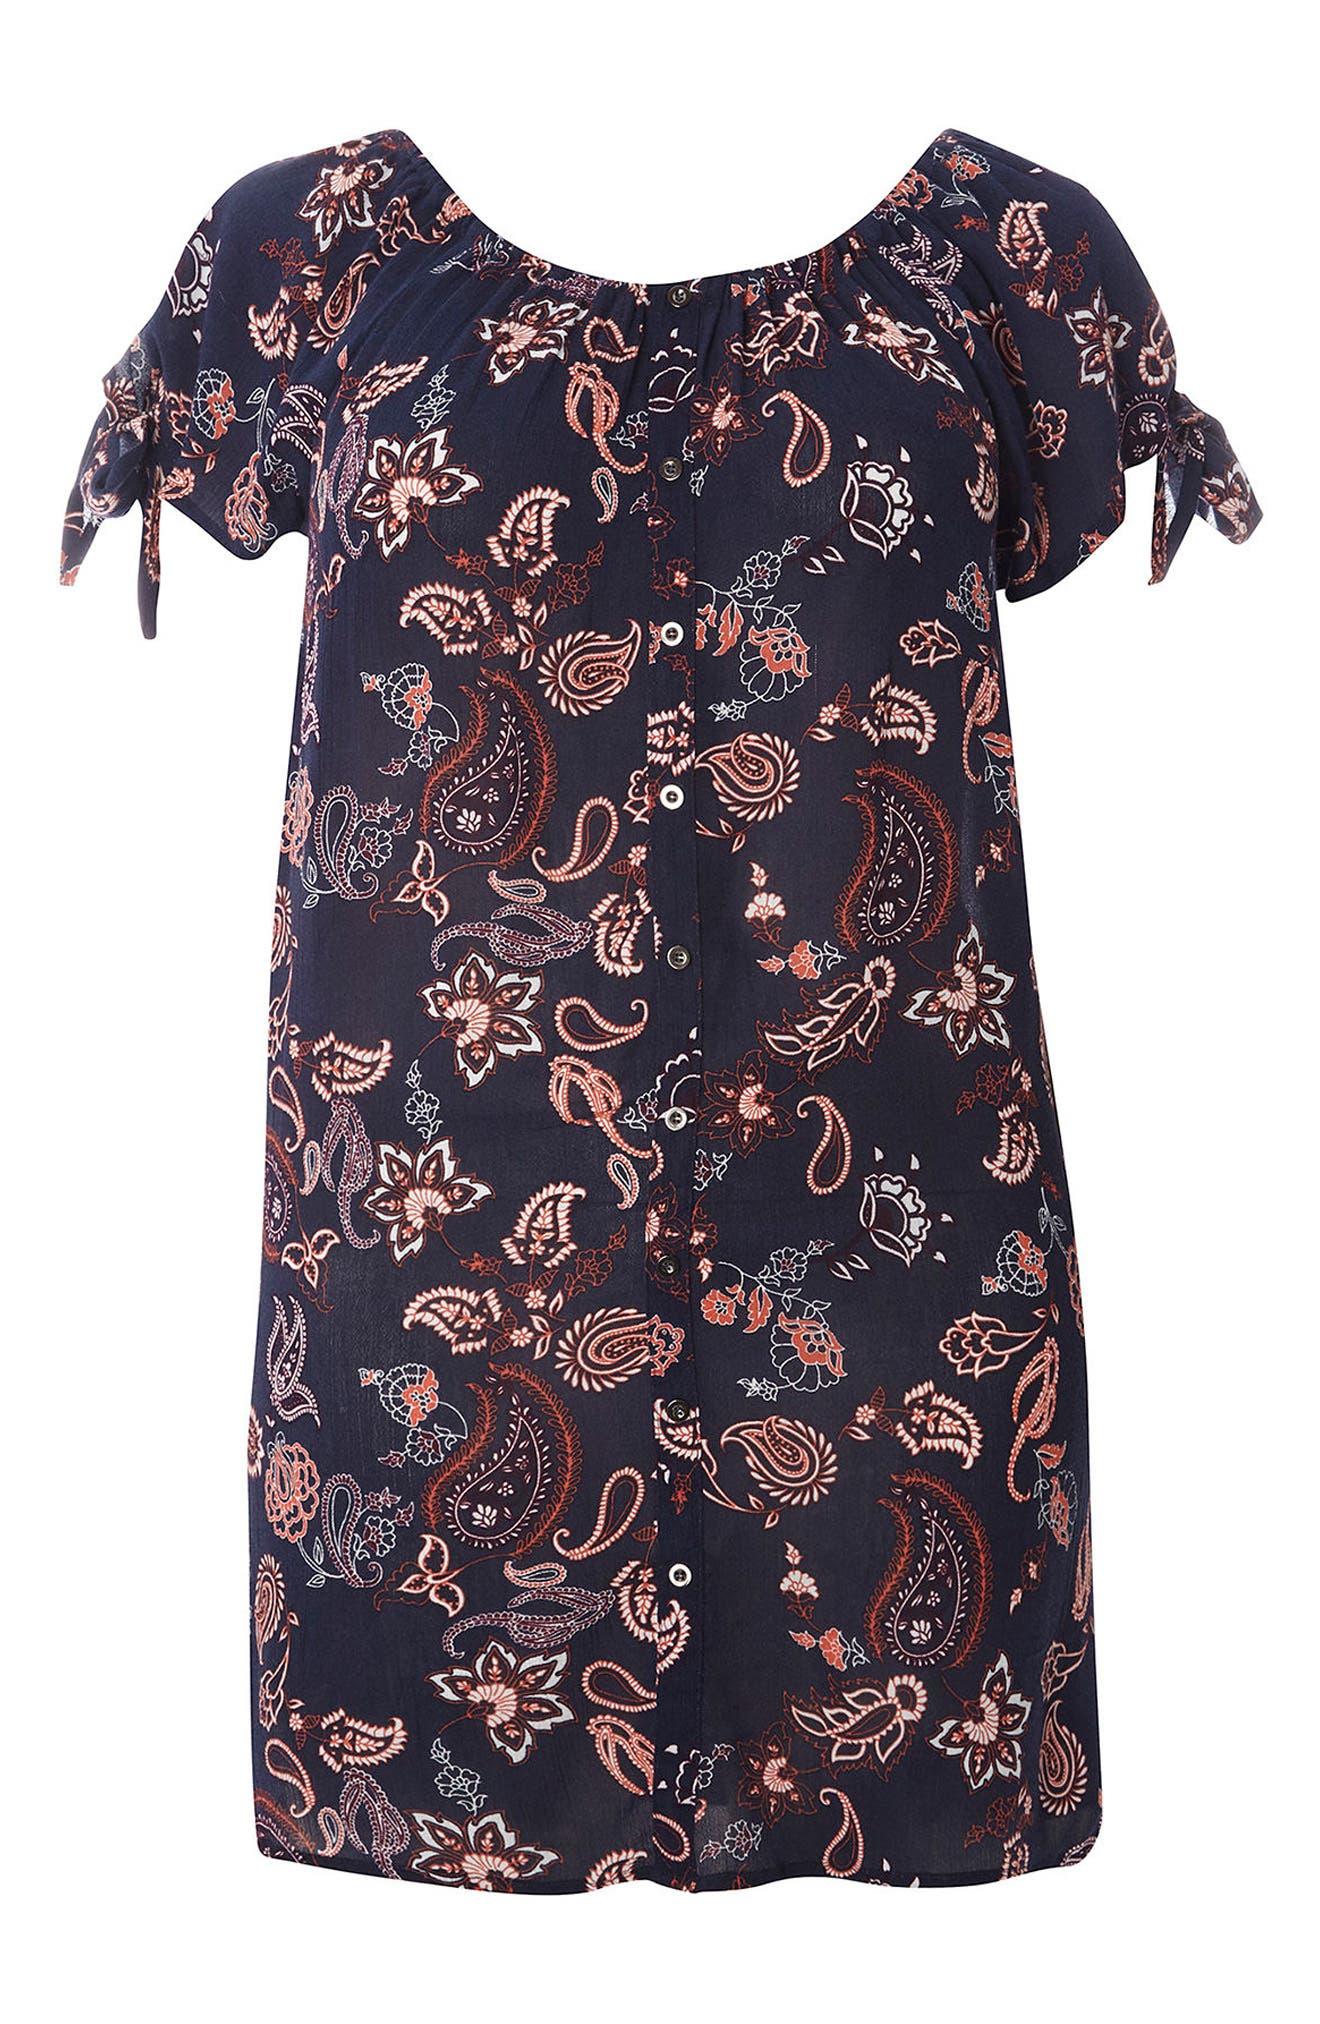 EVANS Paisley Floral Tunic